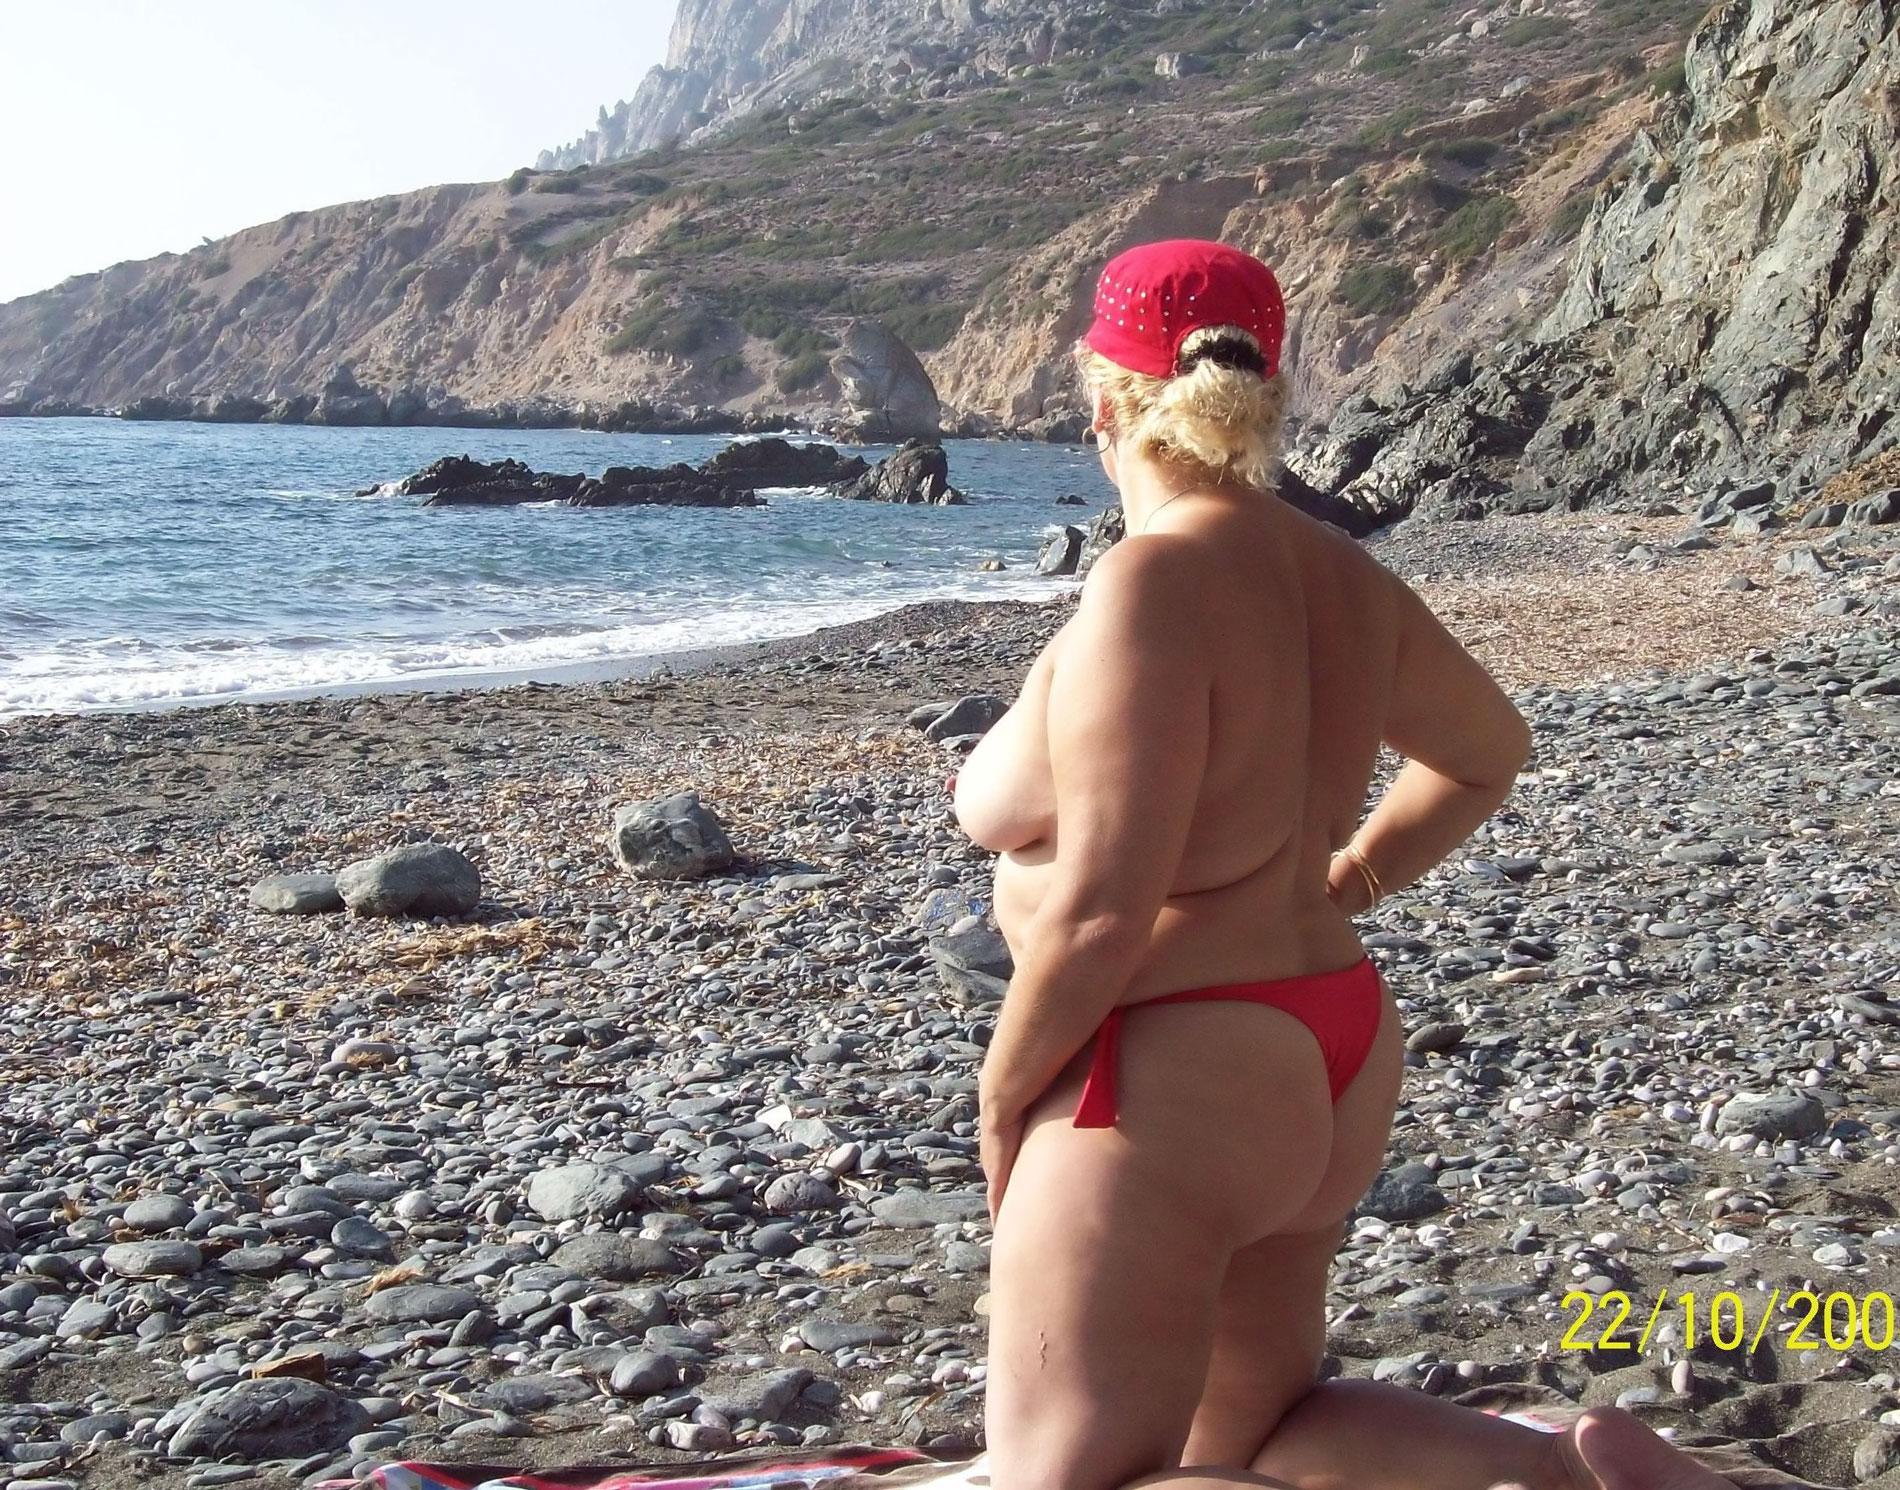 Bbw granny on beach